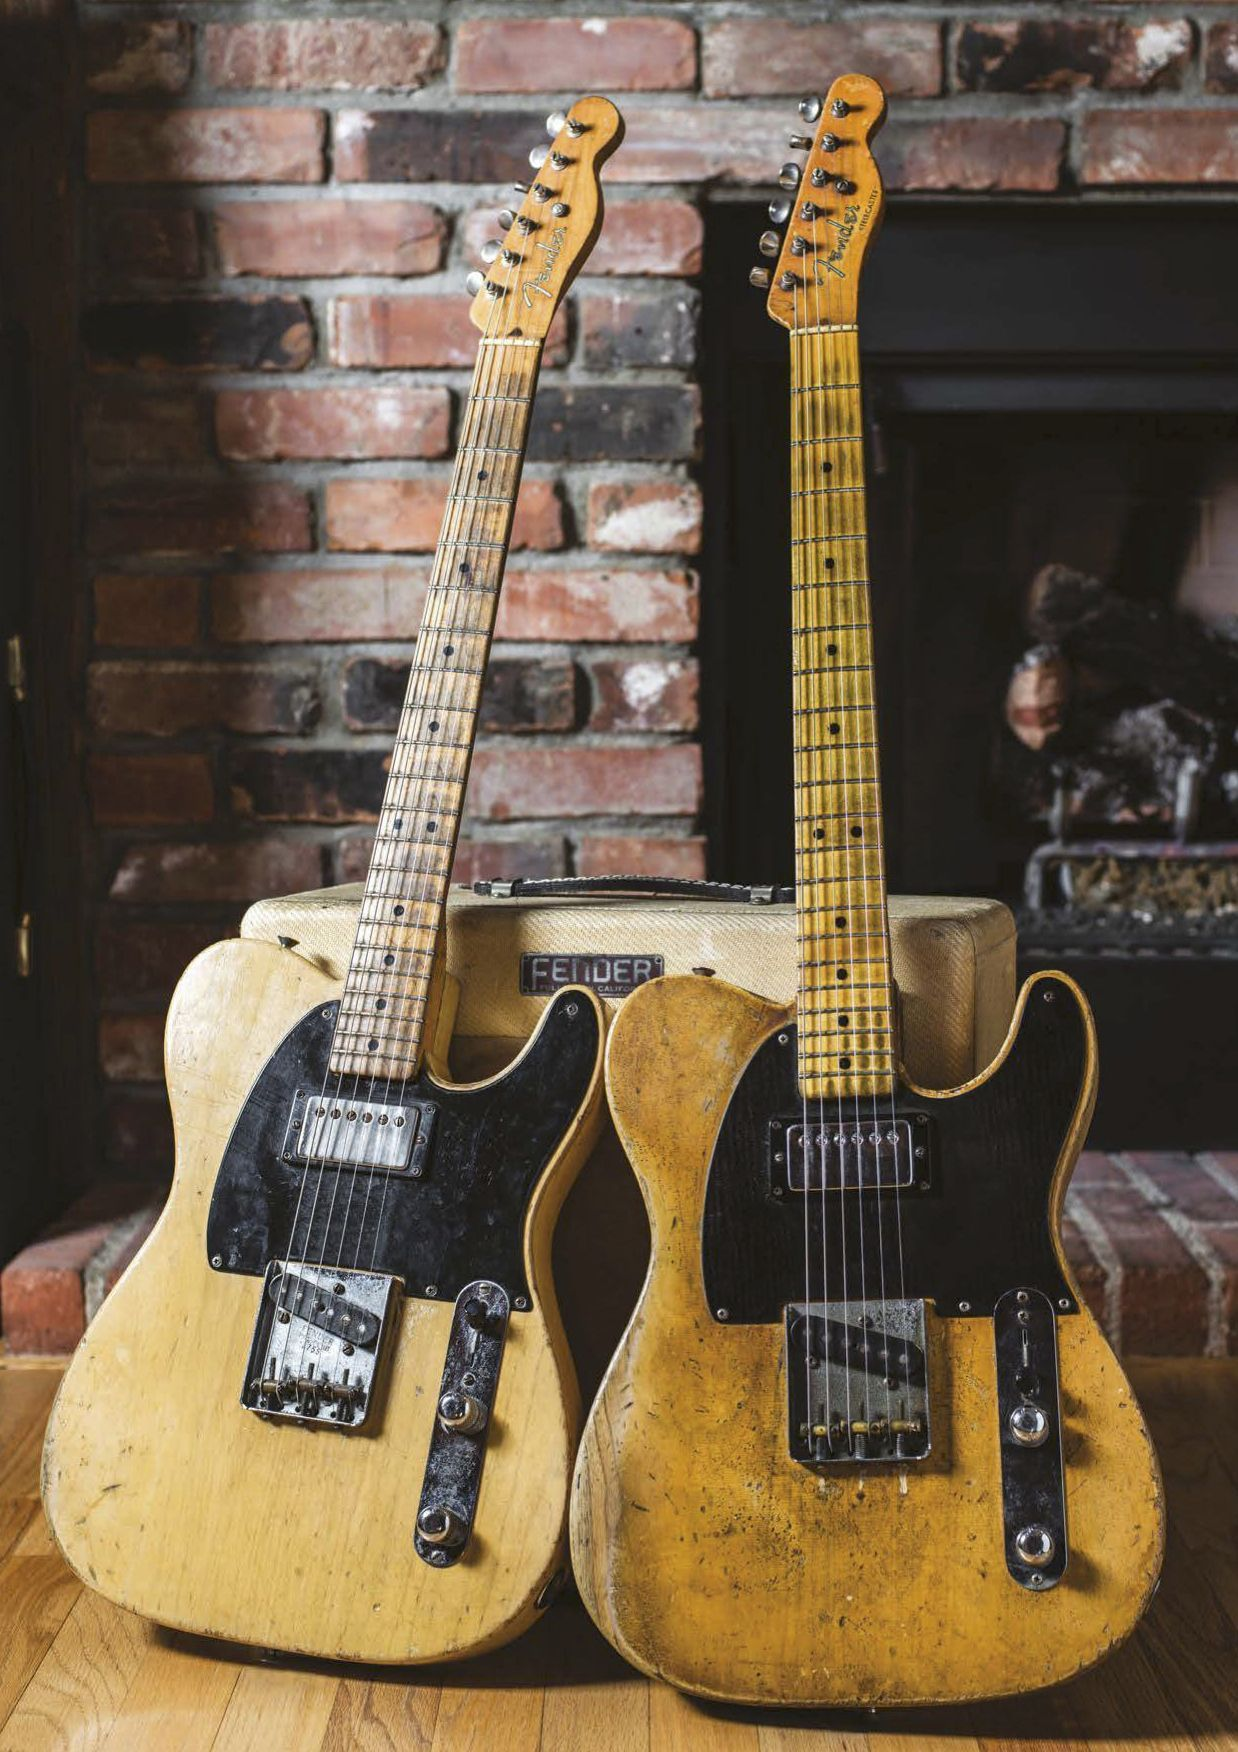 These Fender Telecaster Guitar Are Really Awesome Fendertelecasterguitar Fender Telecaster Guitar Fender Guitars